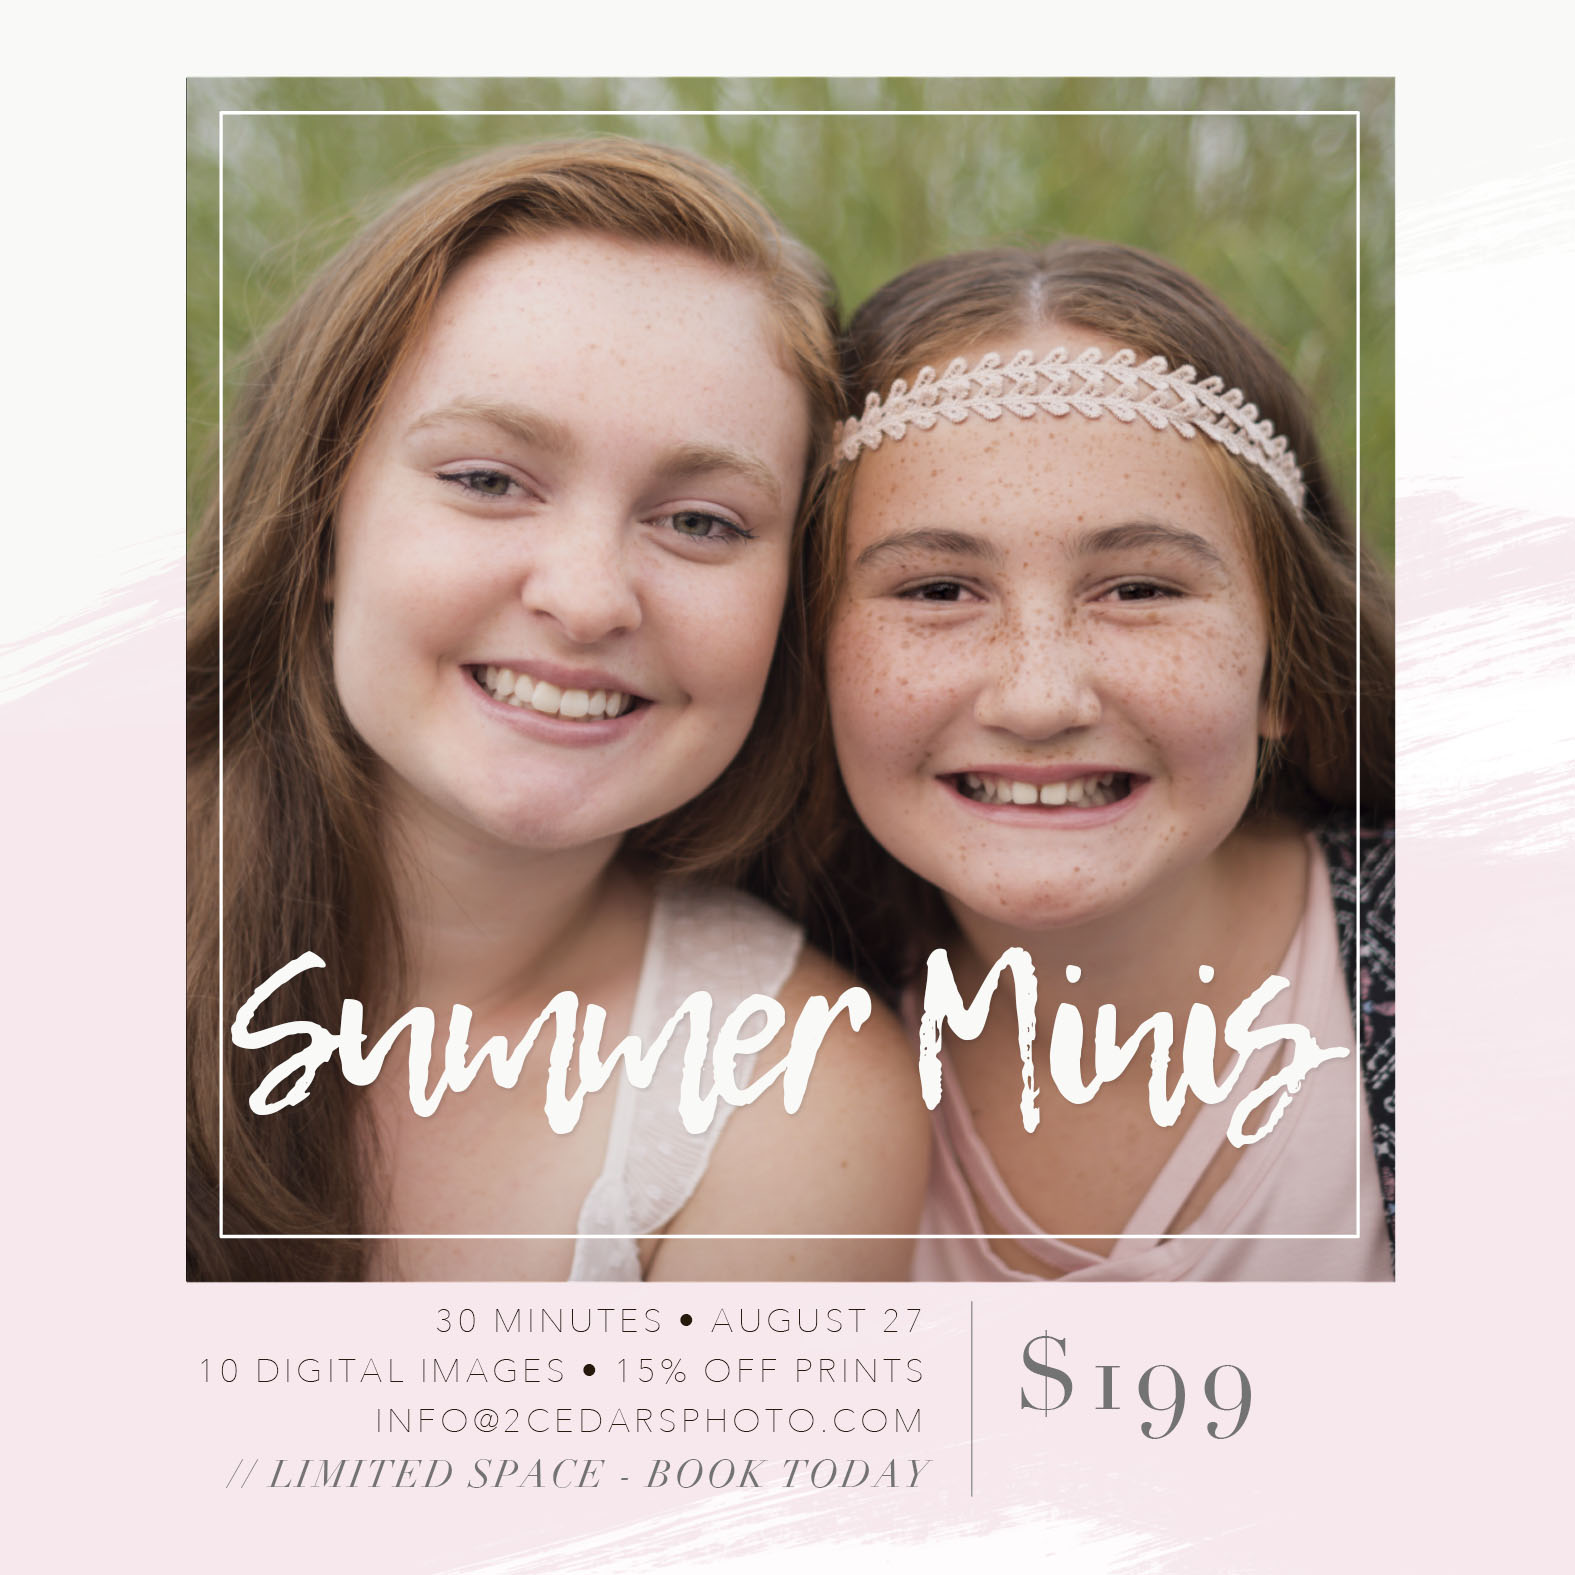 Tacoma mini portrait sessions $199 August 27 - Seattle/Tacoma Photographers - 2 Cedars Photography